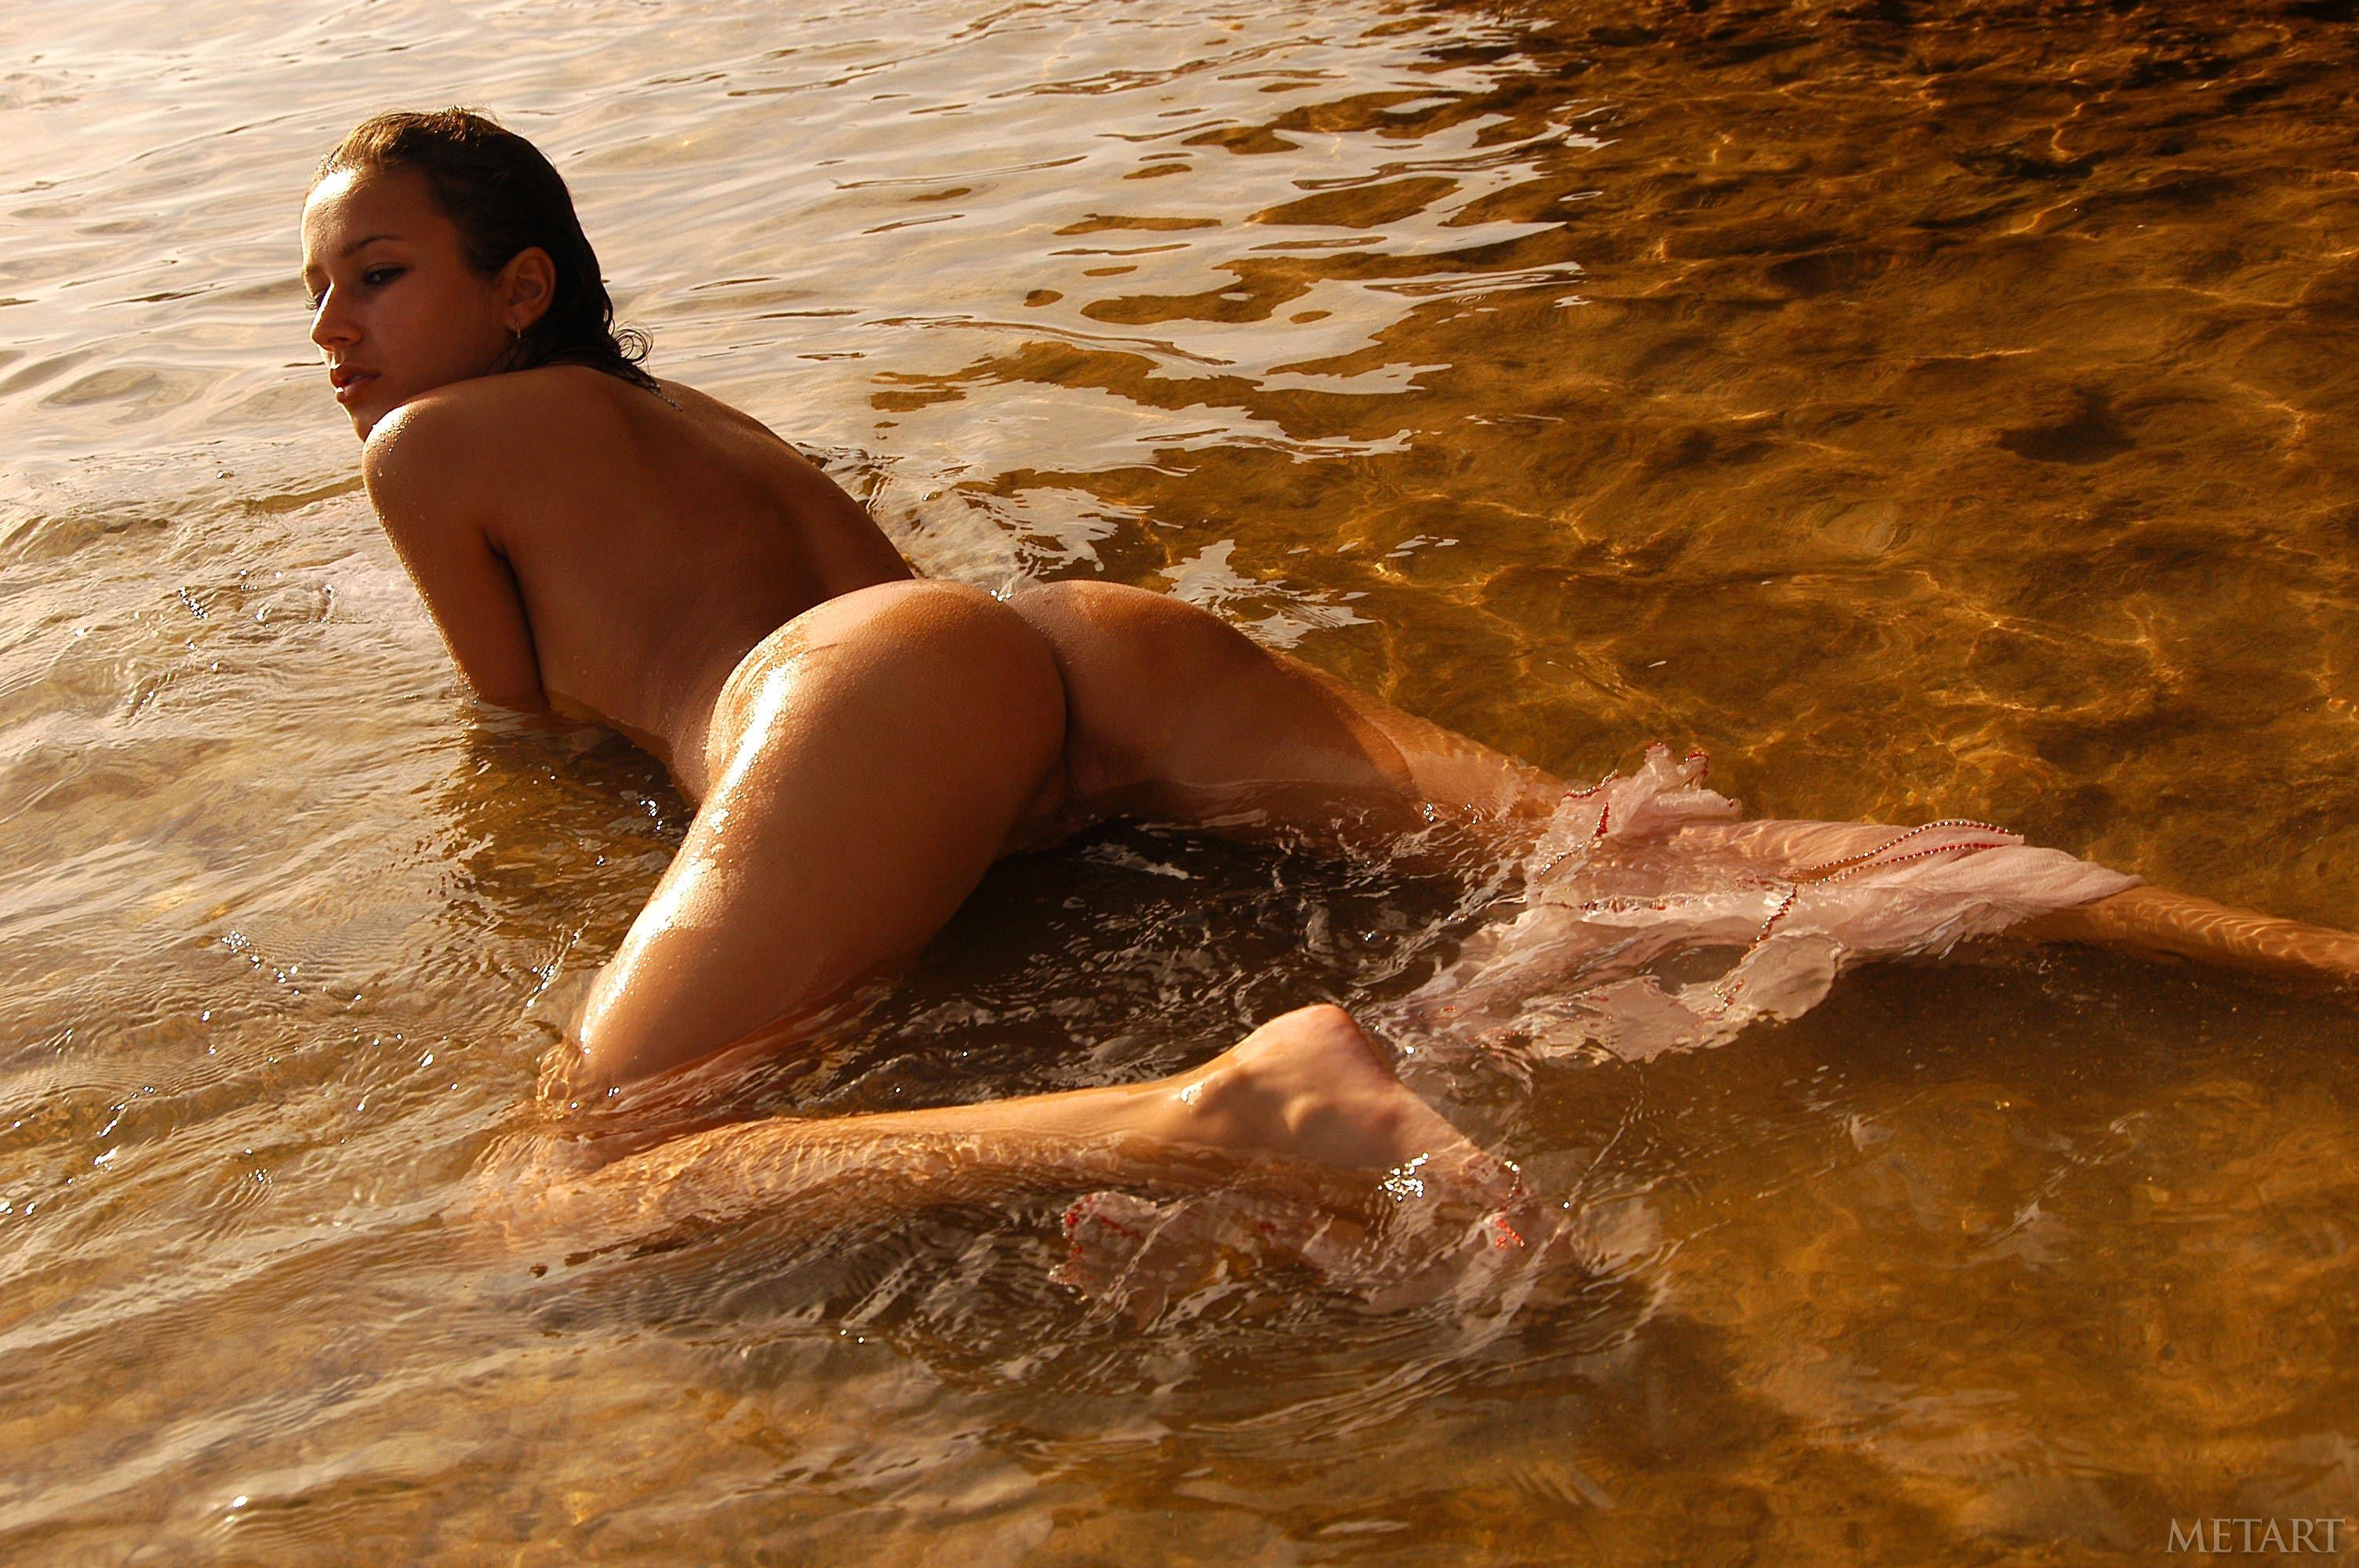 juma-africa-seaside-bikini-metart-38